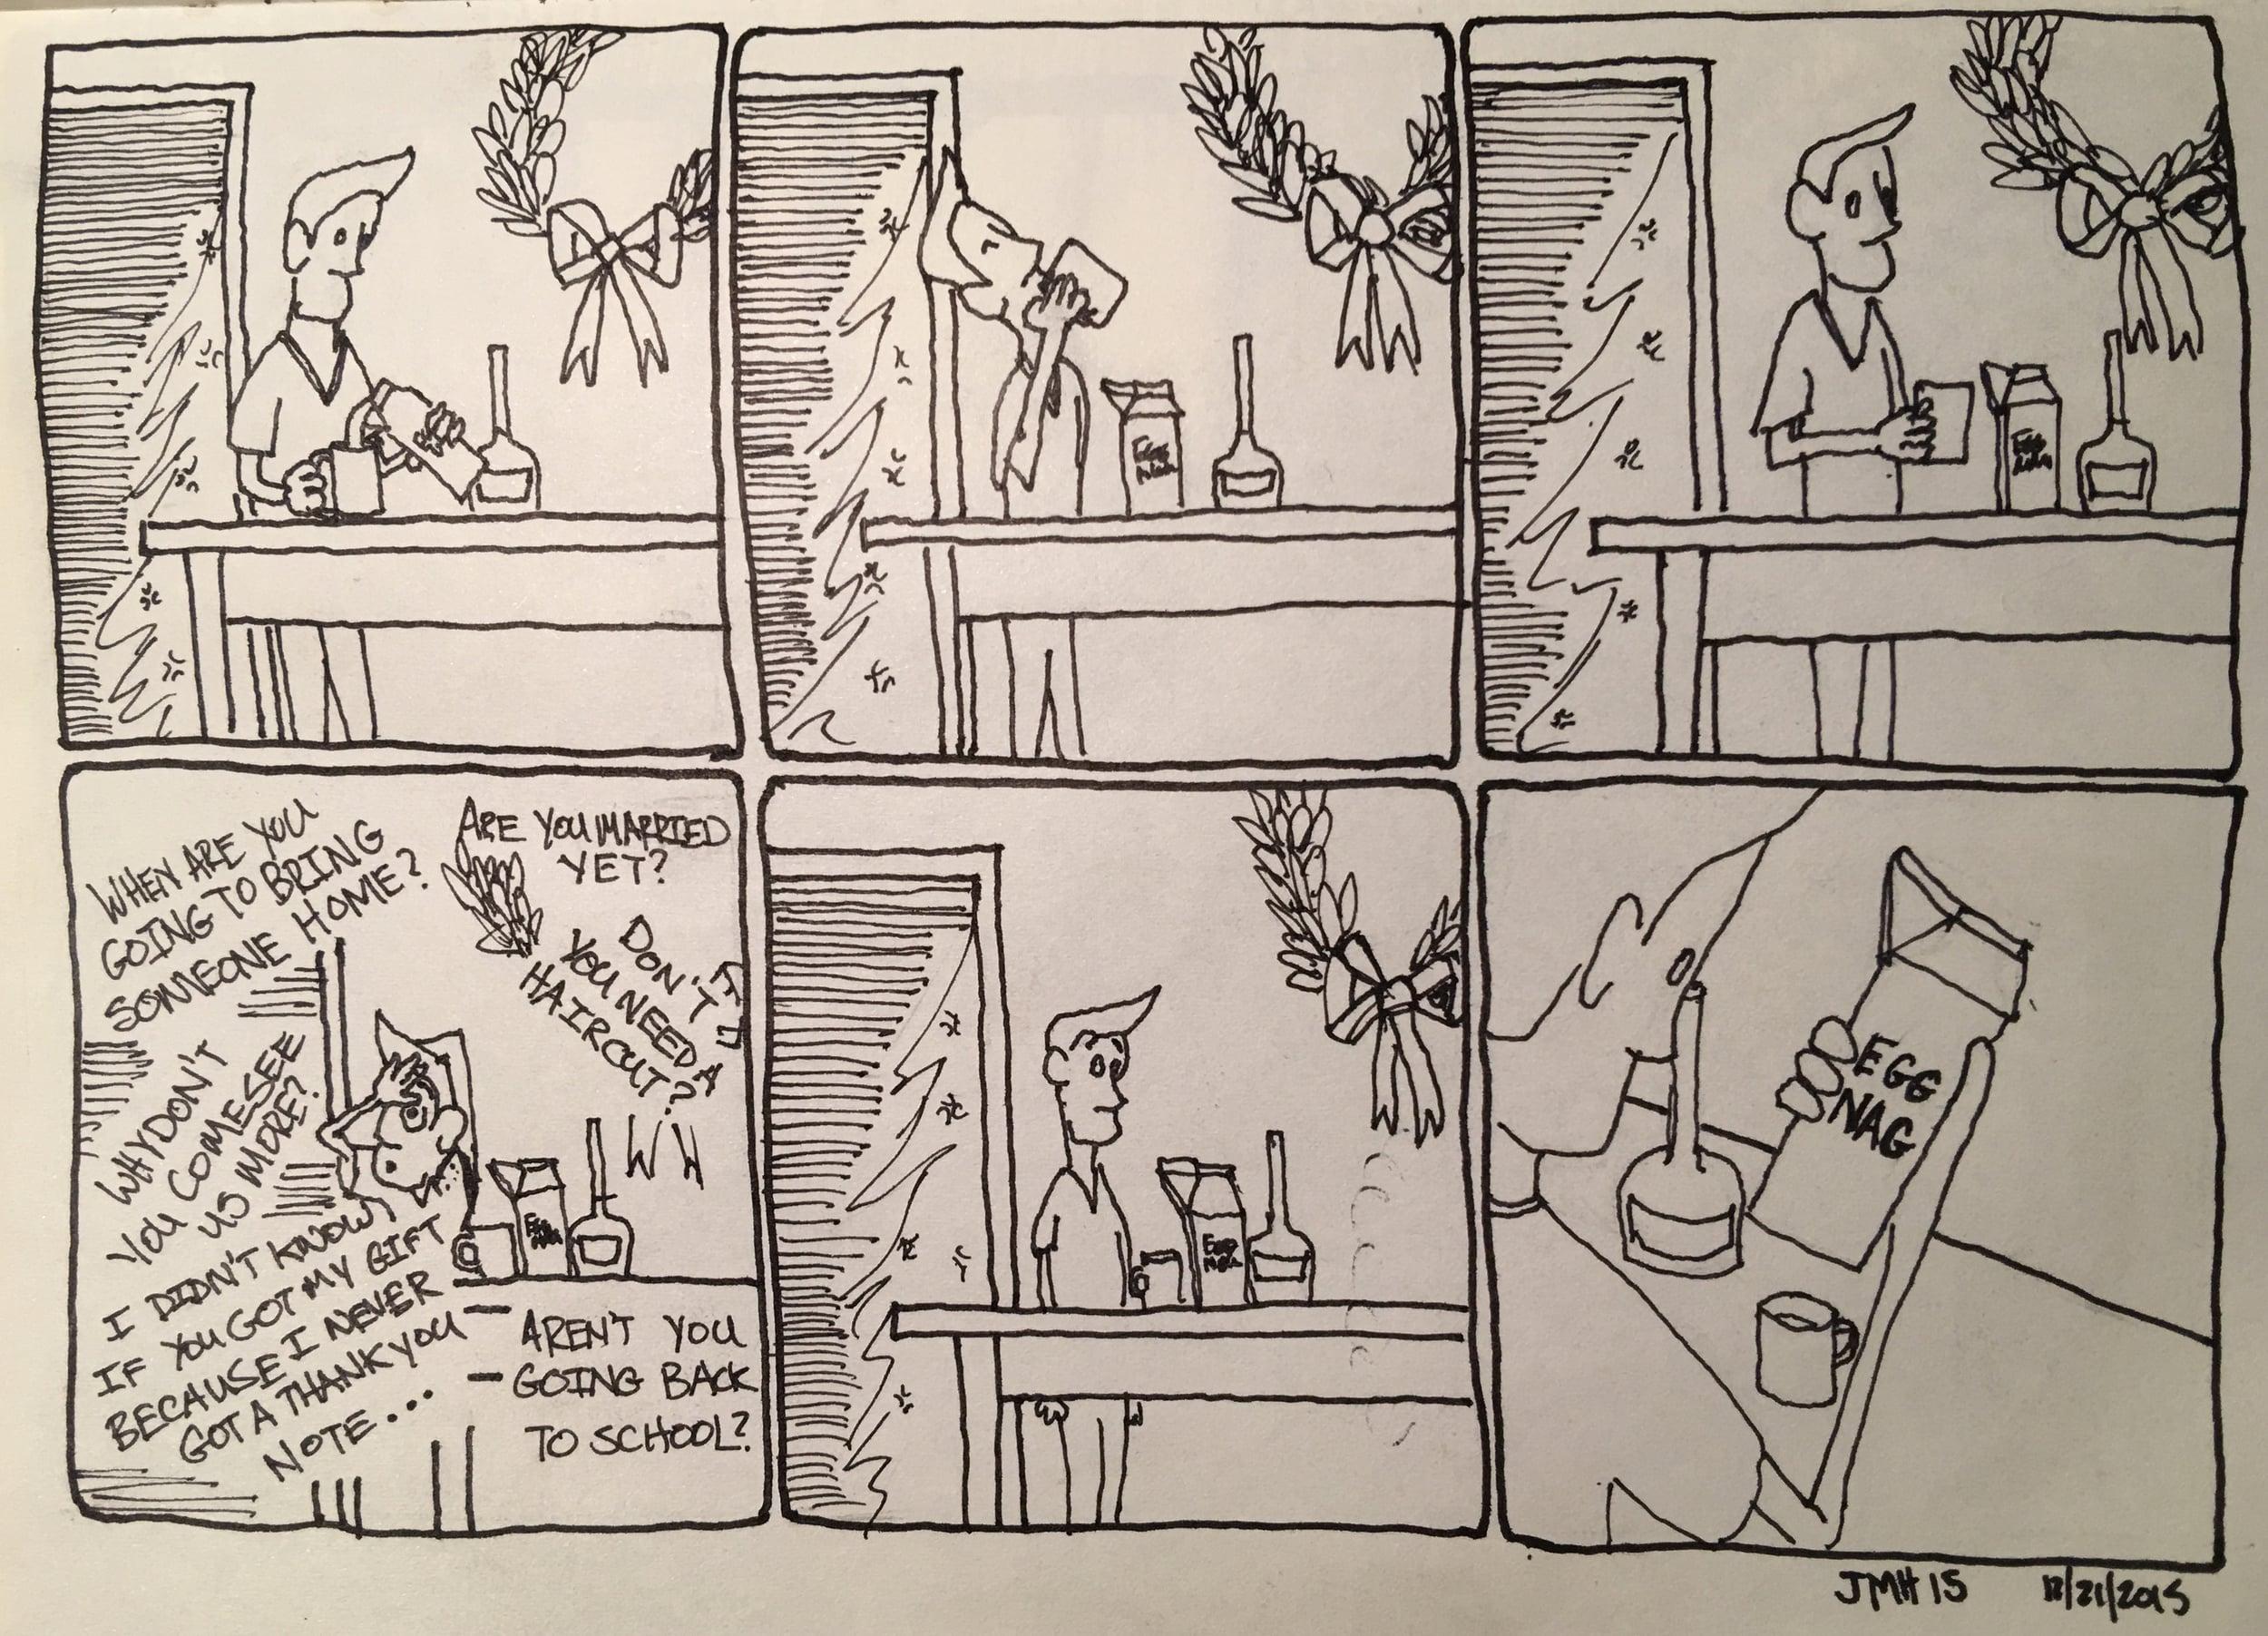 Holiday comics: dad joke?